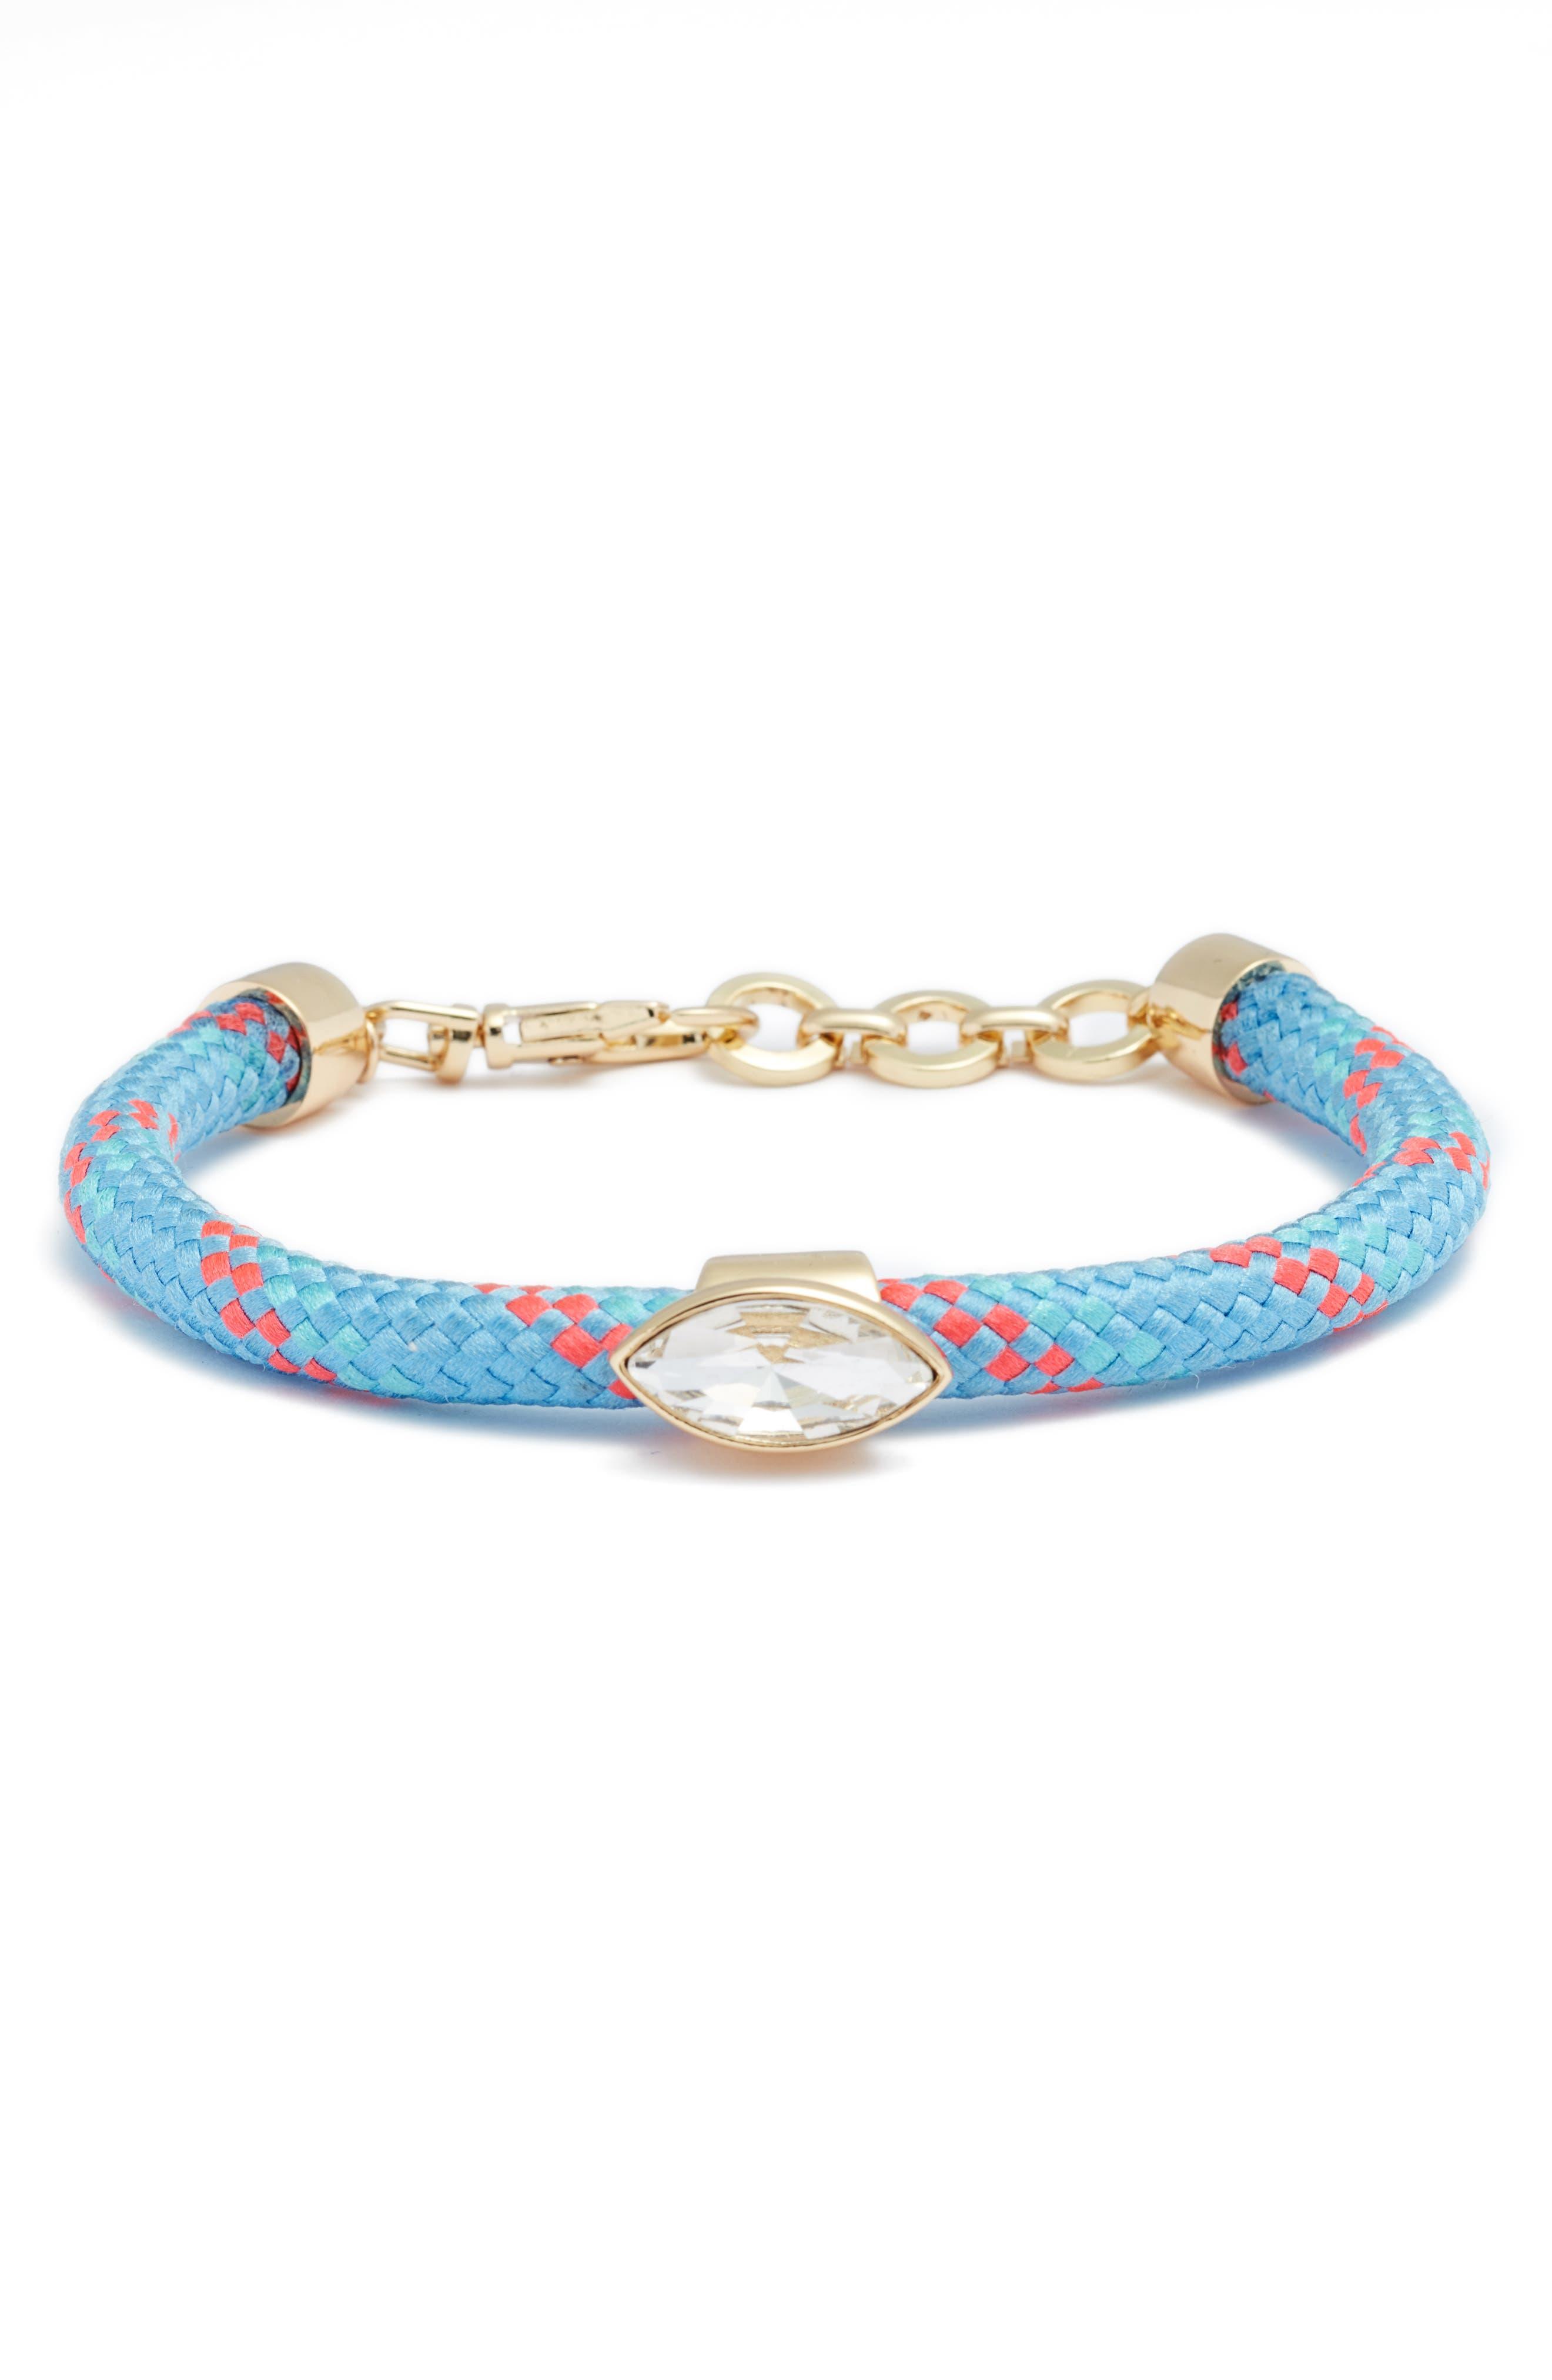 Climbing Rope Bracelet,                             Main thumbnail 1, color,                             400